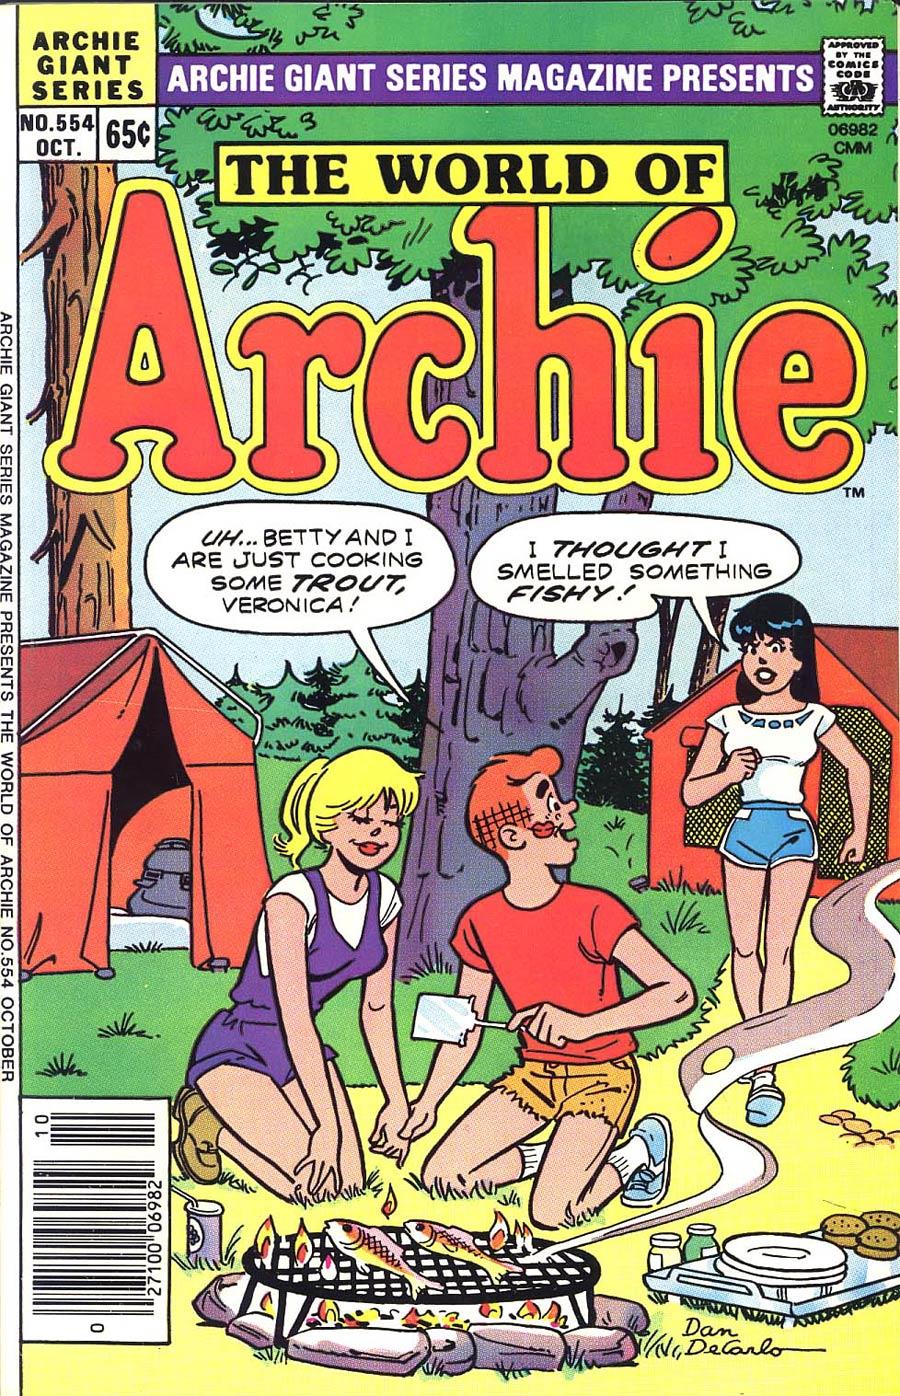 Archie Giant Series Magazine #554